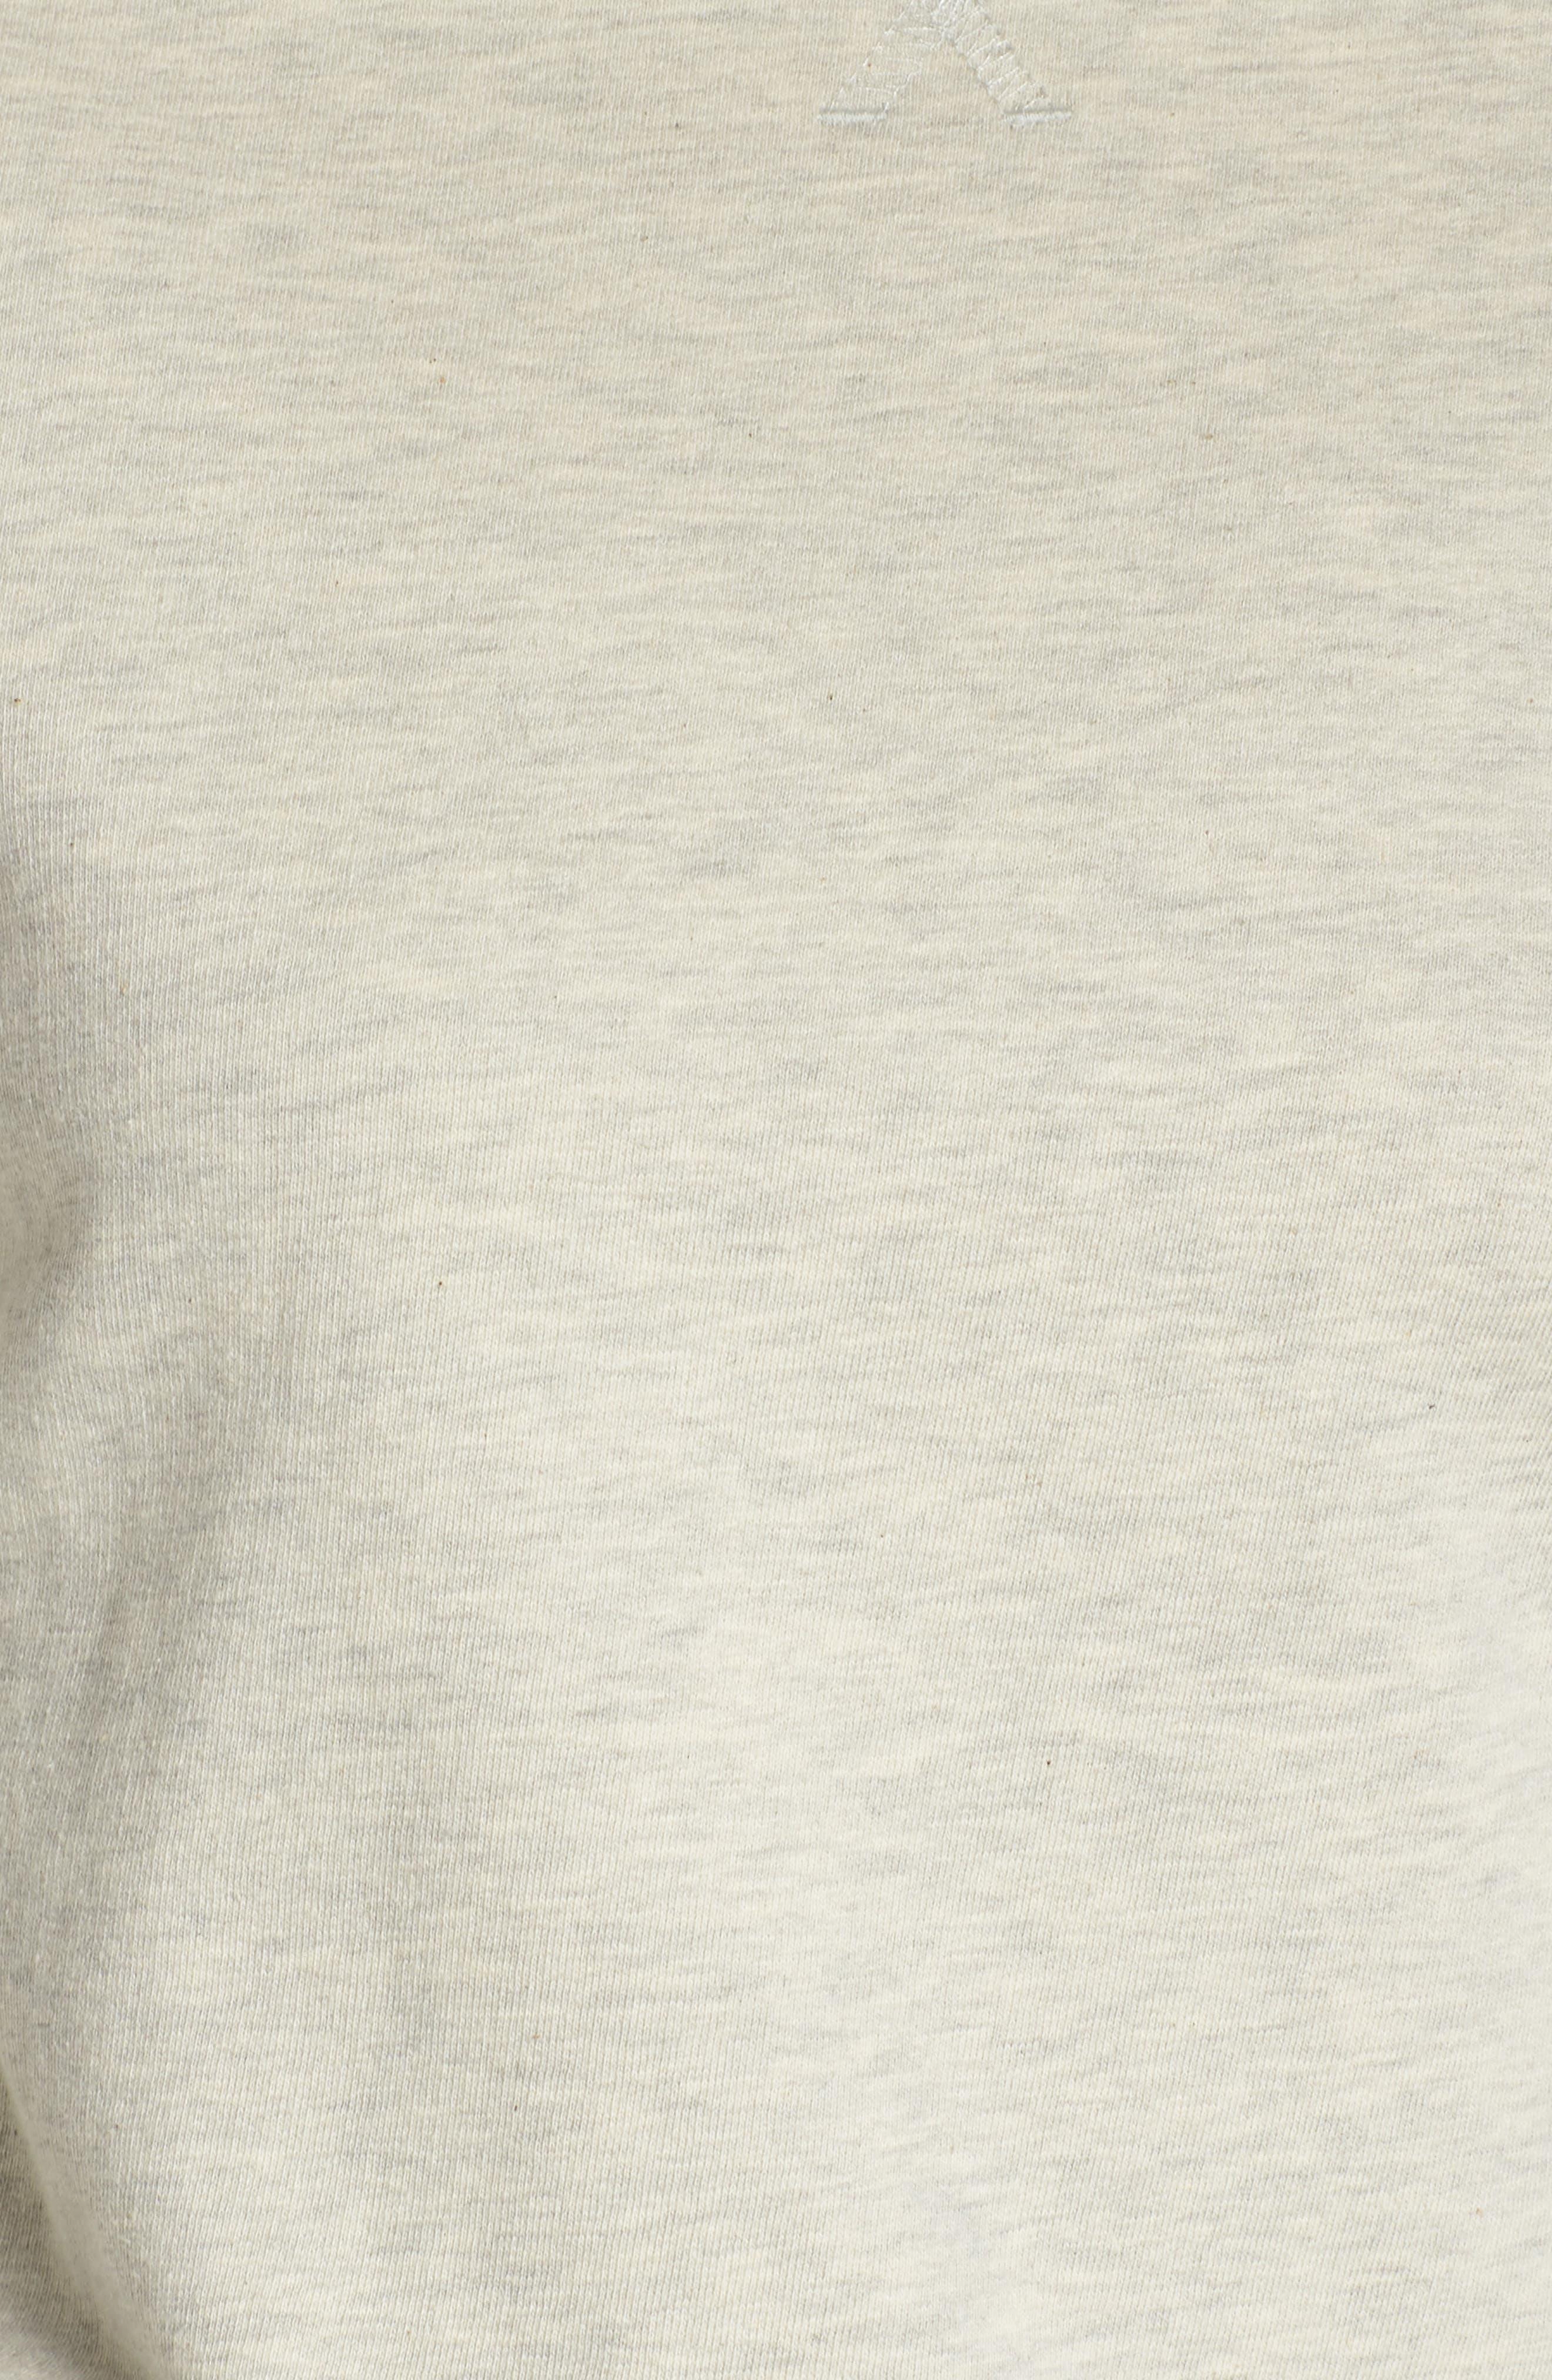 Crew Sweatshirt,                             Alternate thumbnail 5, color,                             266